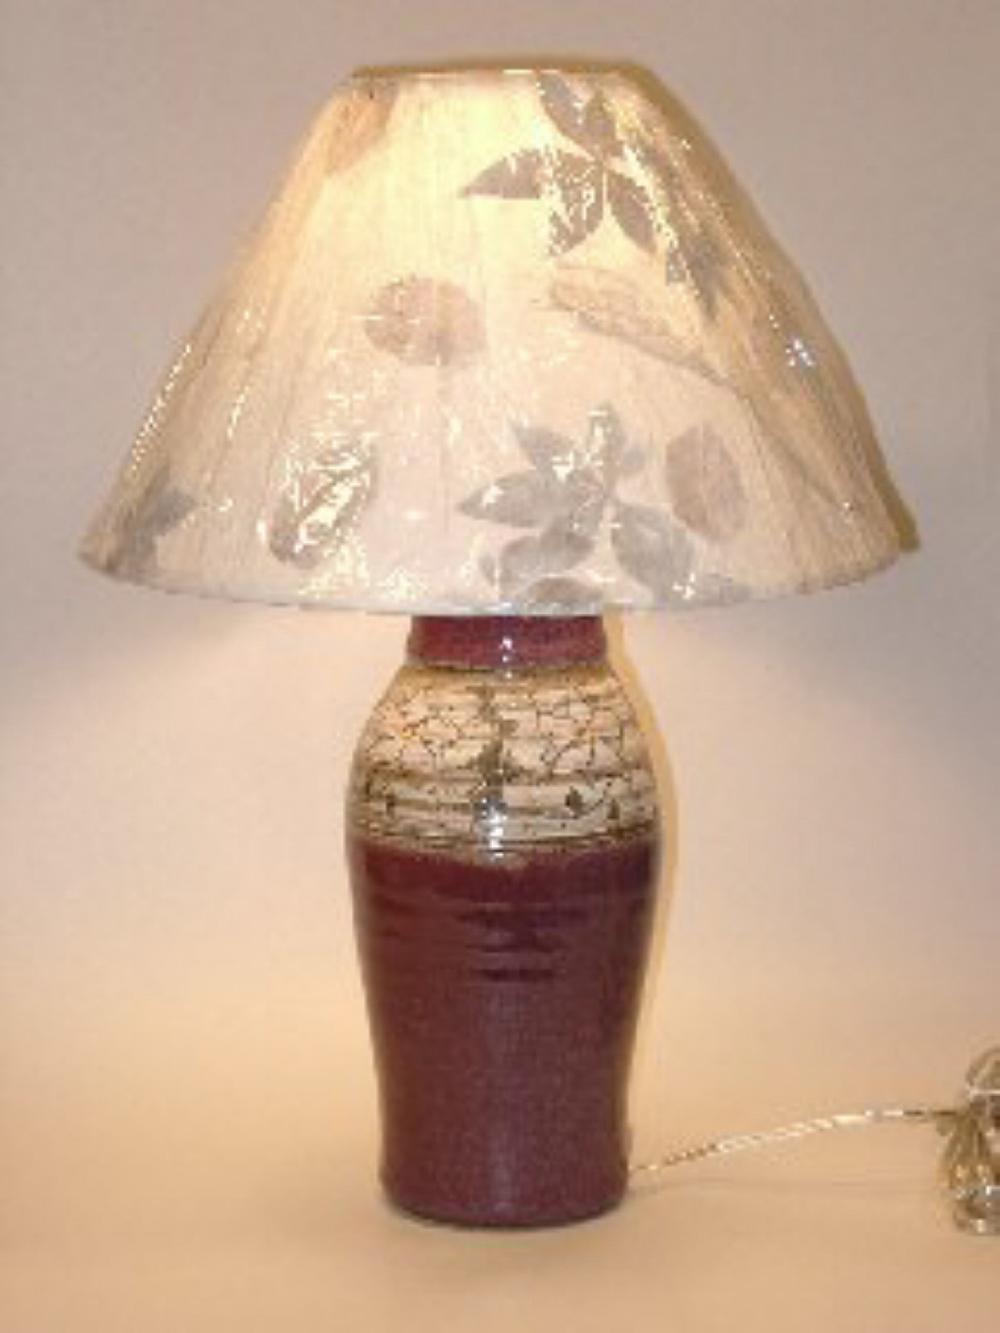 f-3-45-8063630_5ULVLHZl_9-inch_lamp.jpg